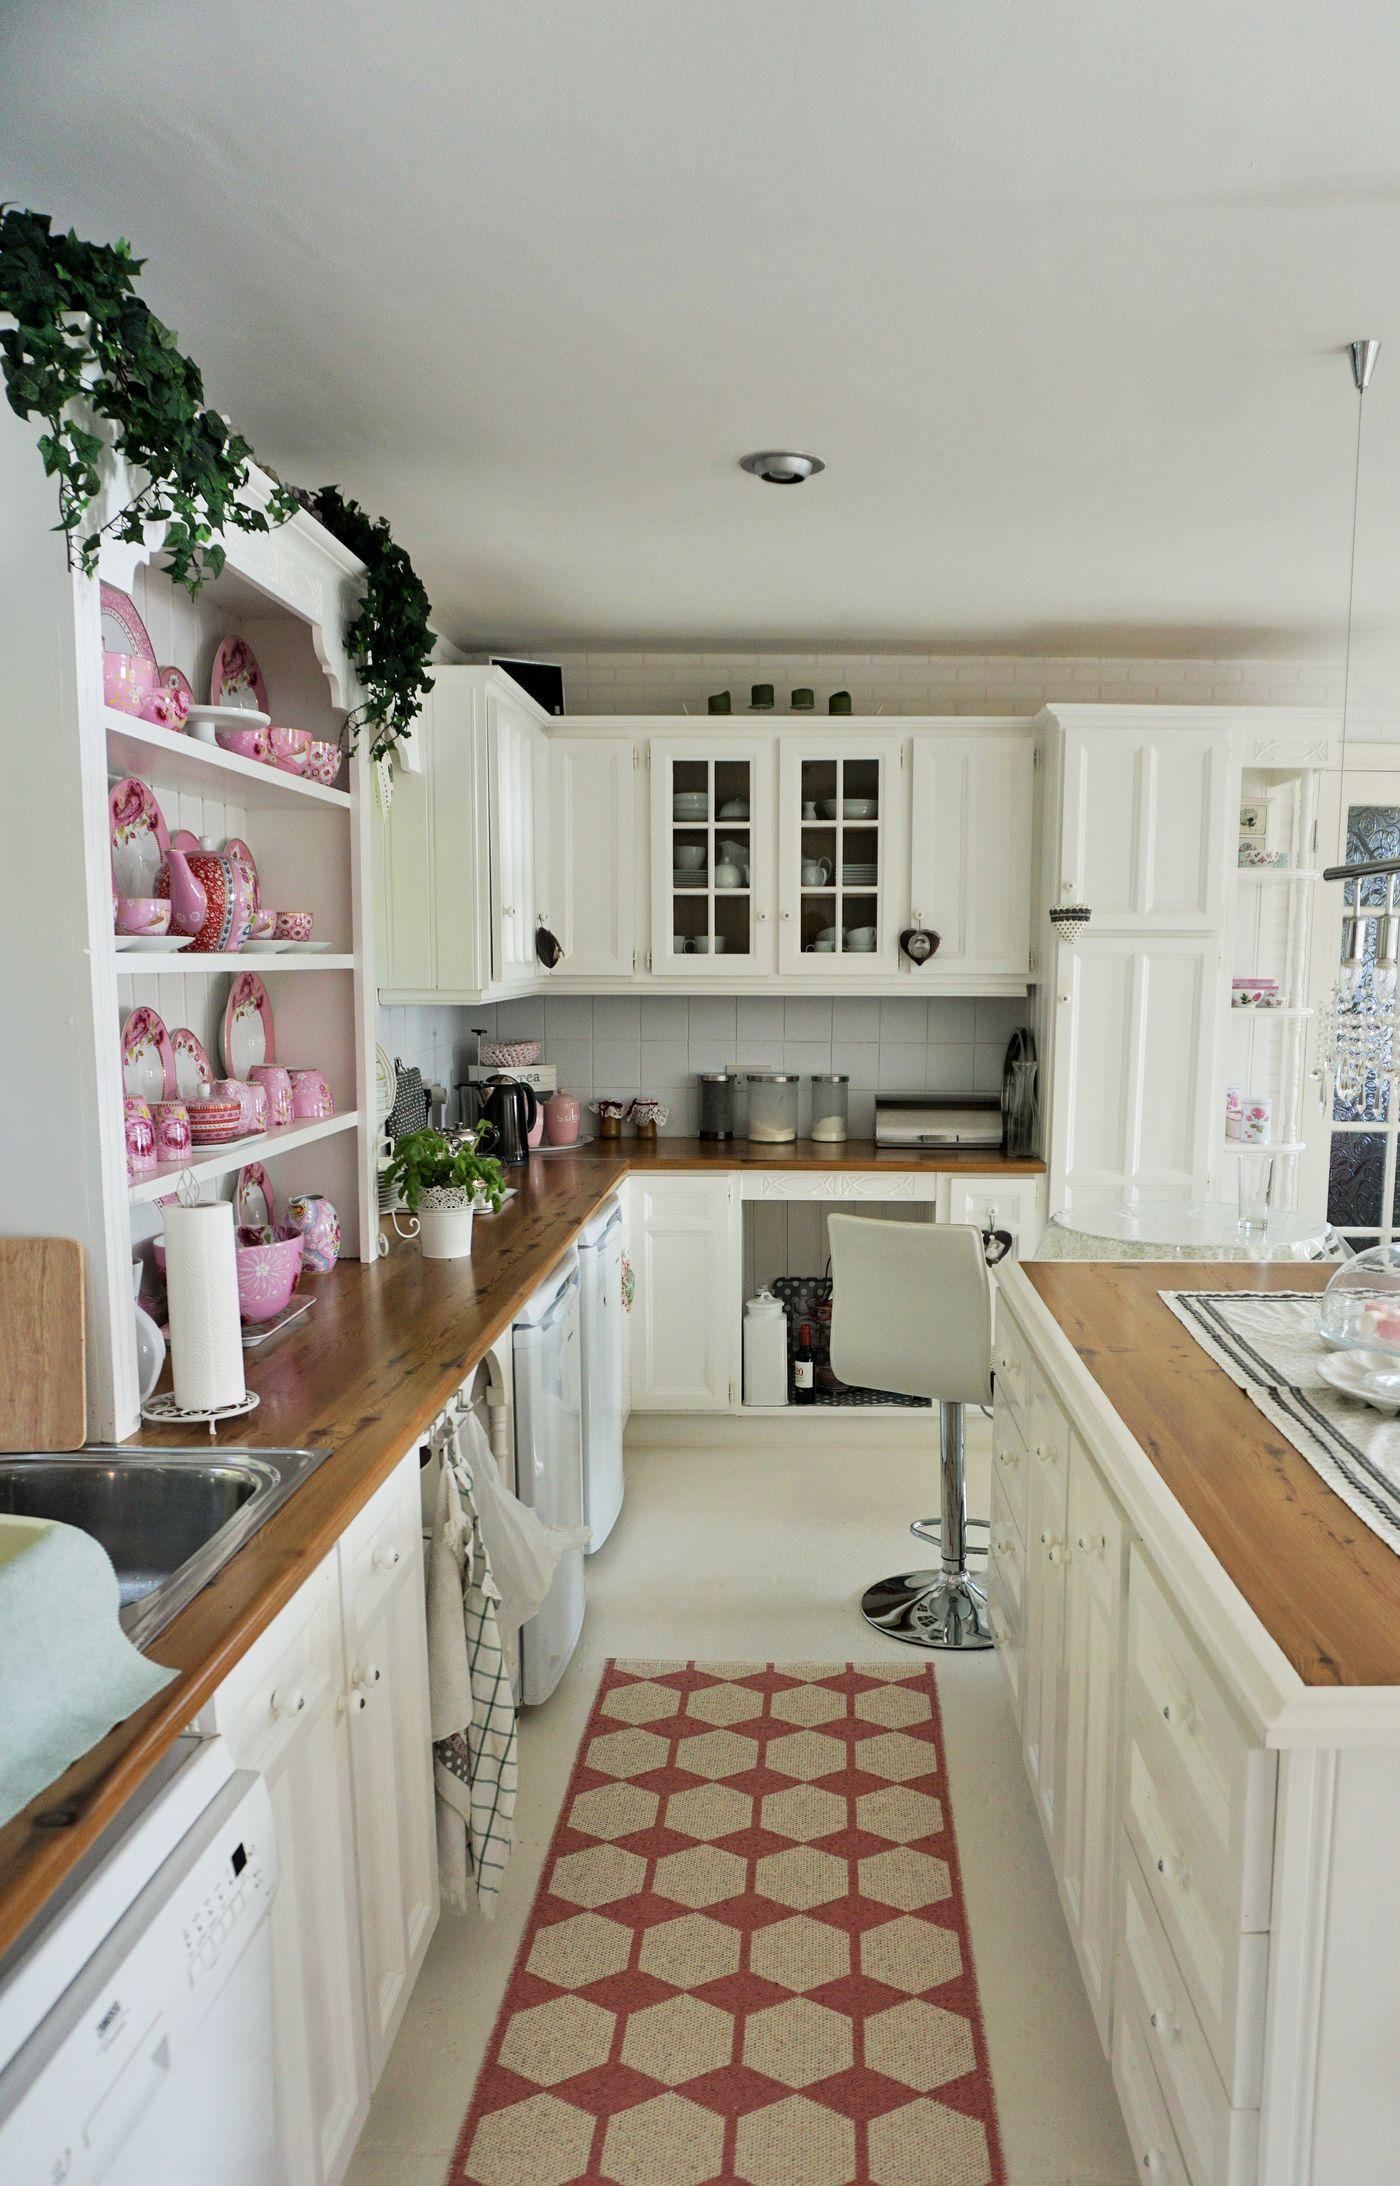 landhausk chen vorh nge 24 expert gardinen f r k che esszimmer njb9 us. Black Bedroom Furniture Sets. Home Design Ideas